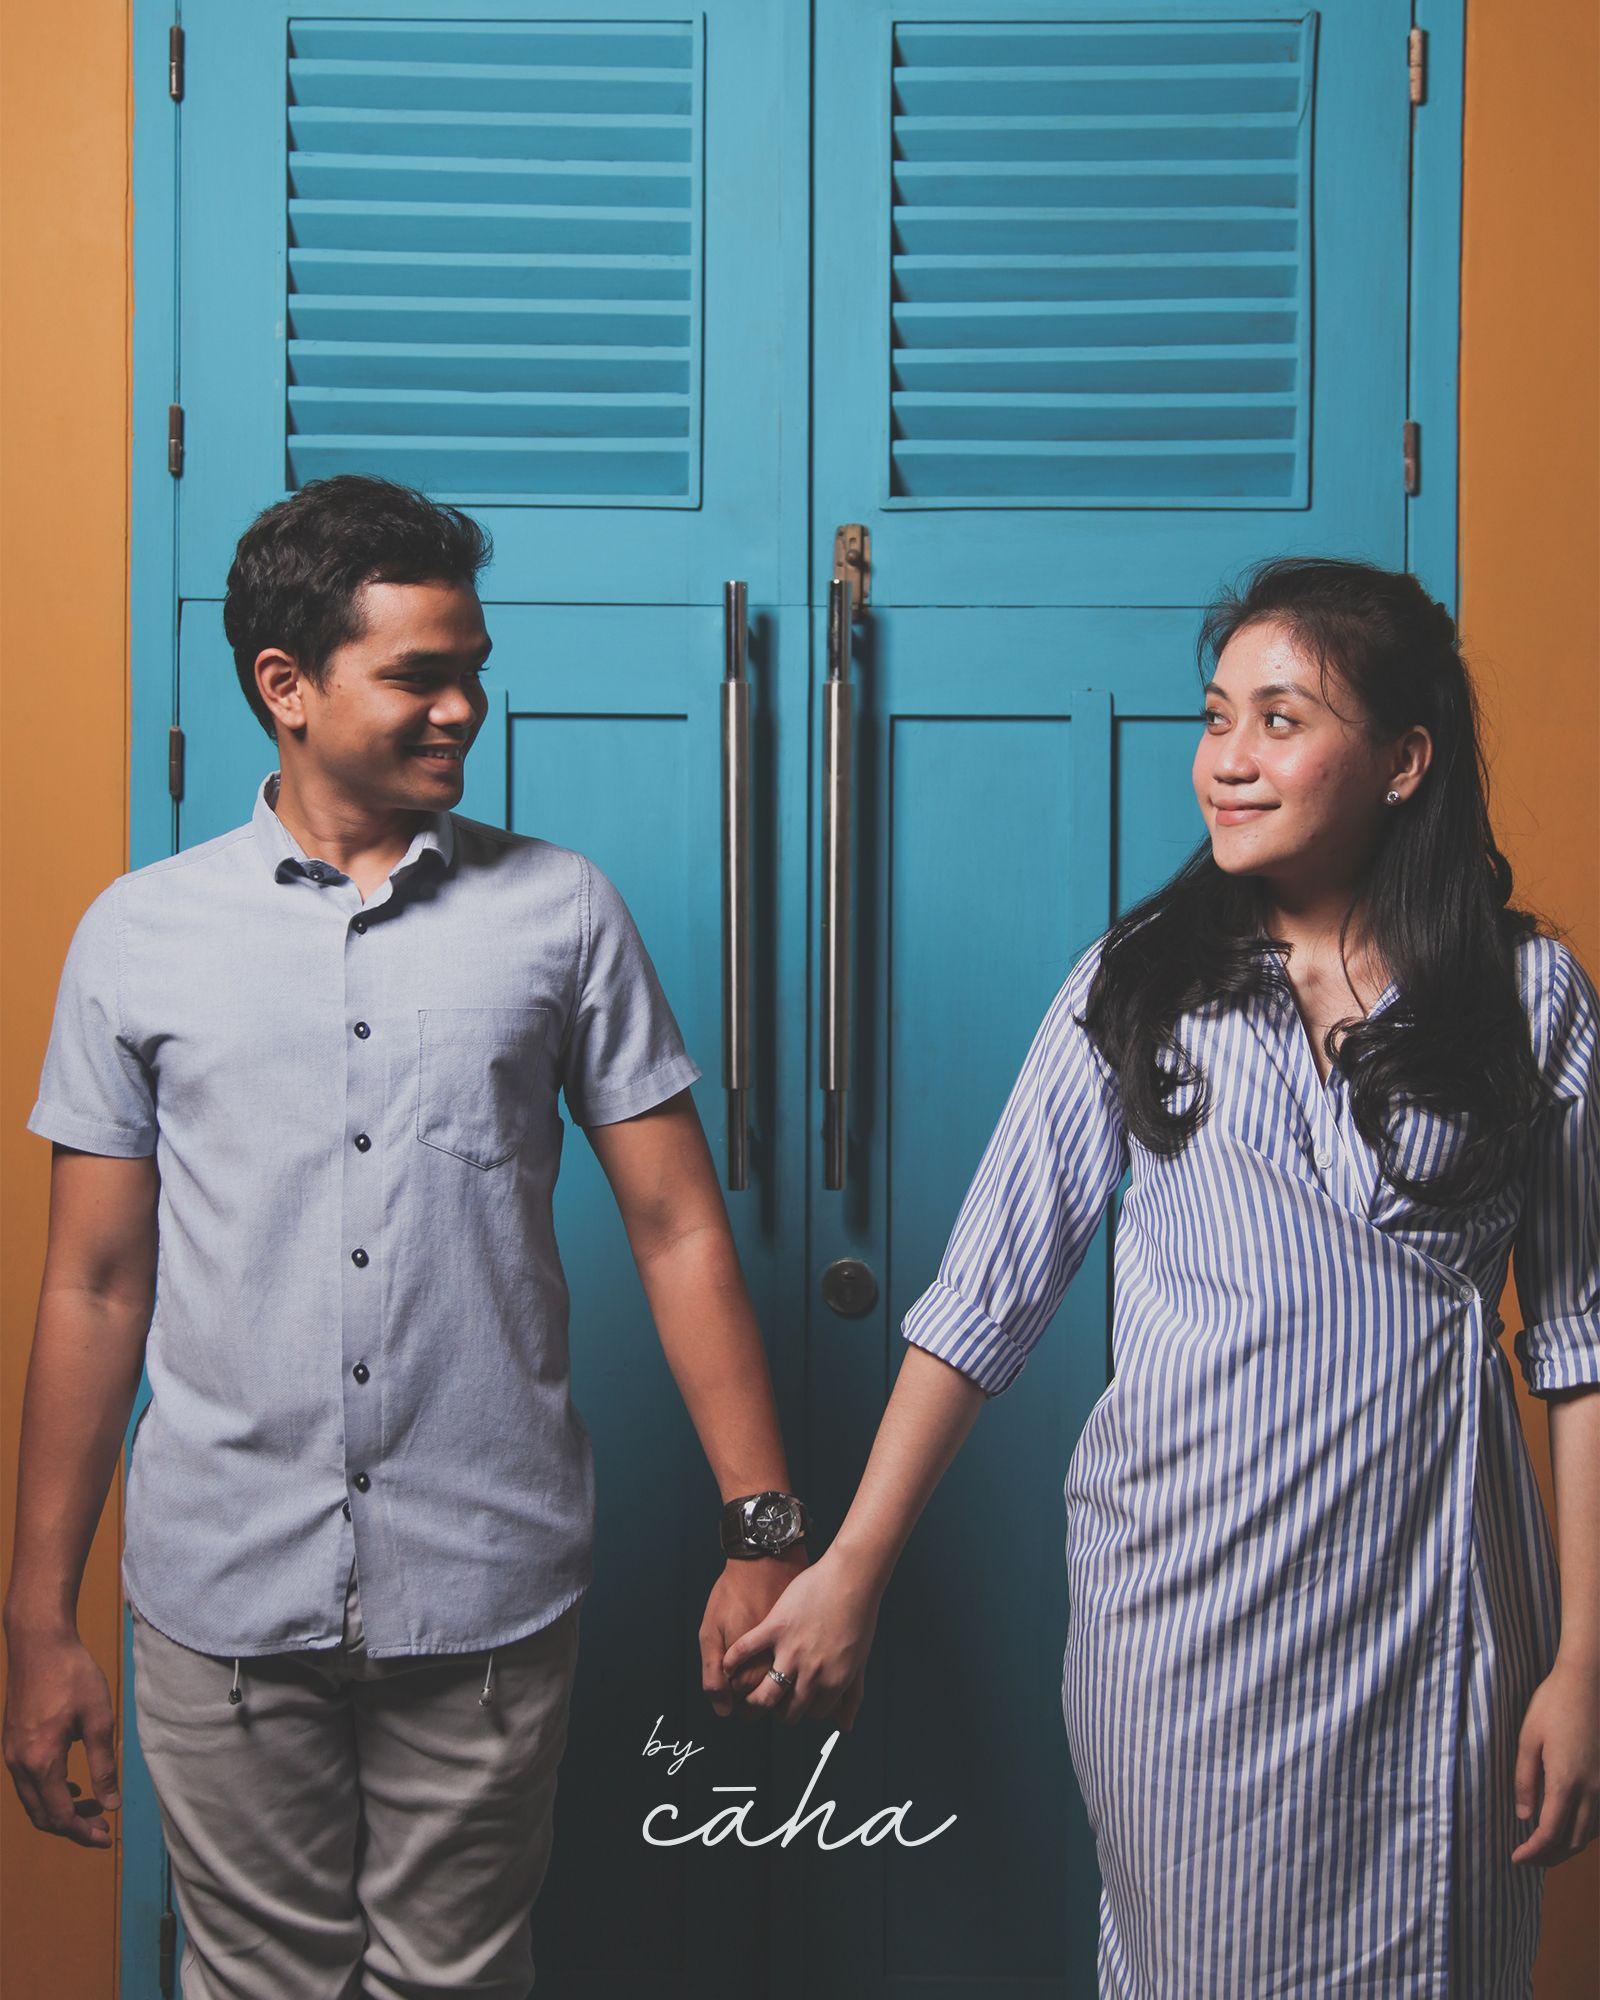 Prewedding Photography At Caha Studio Jakarta